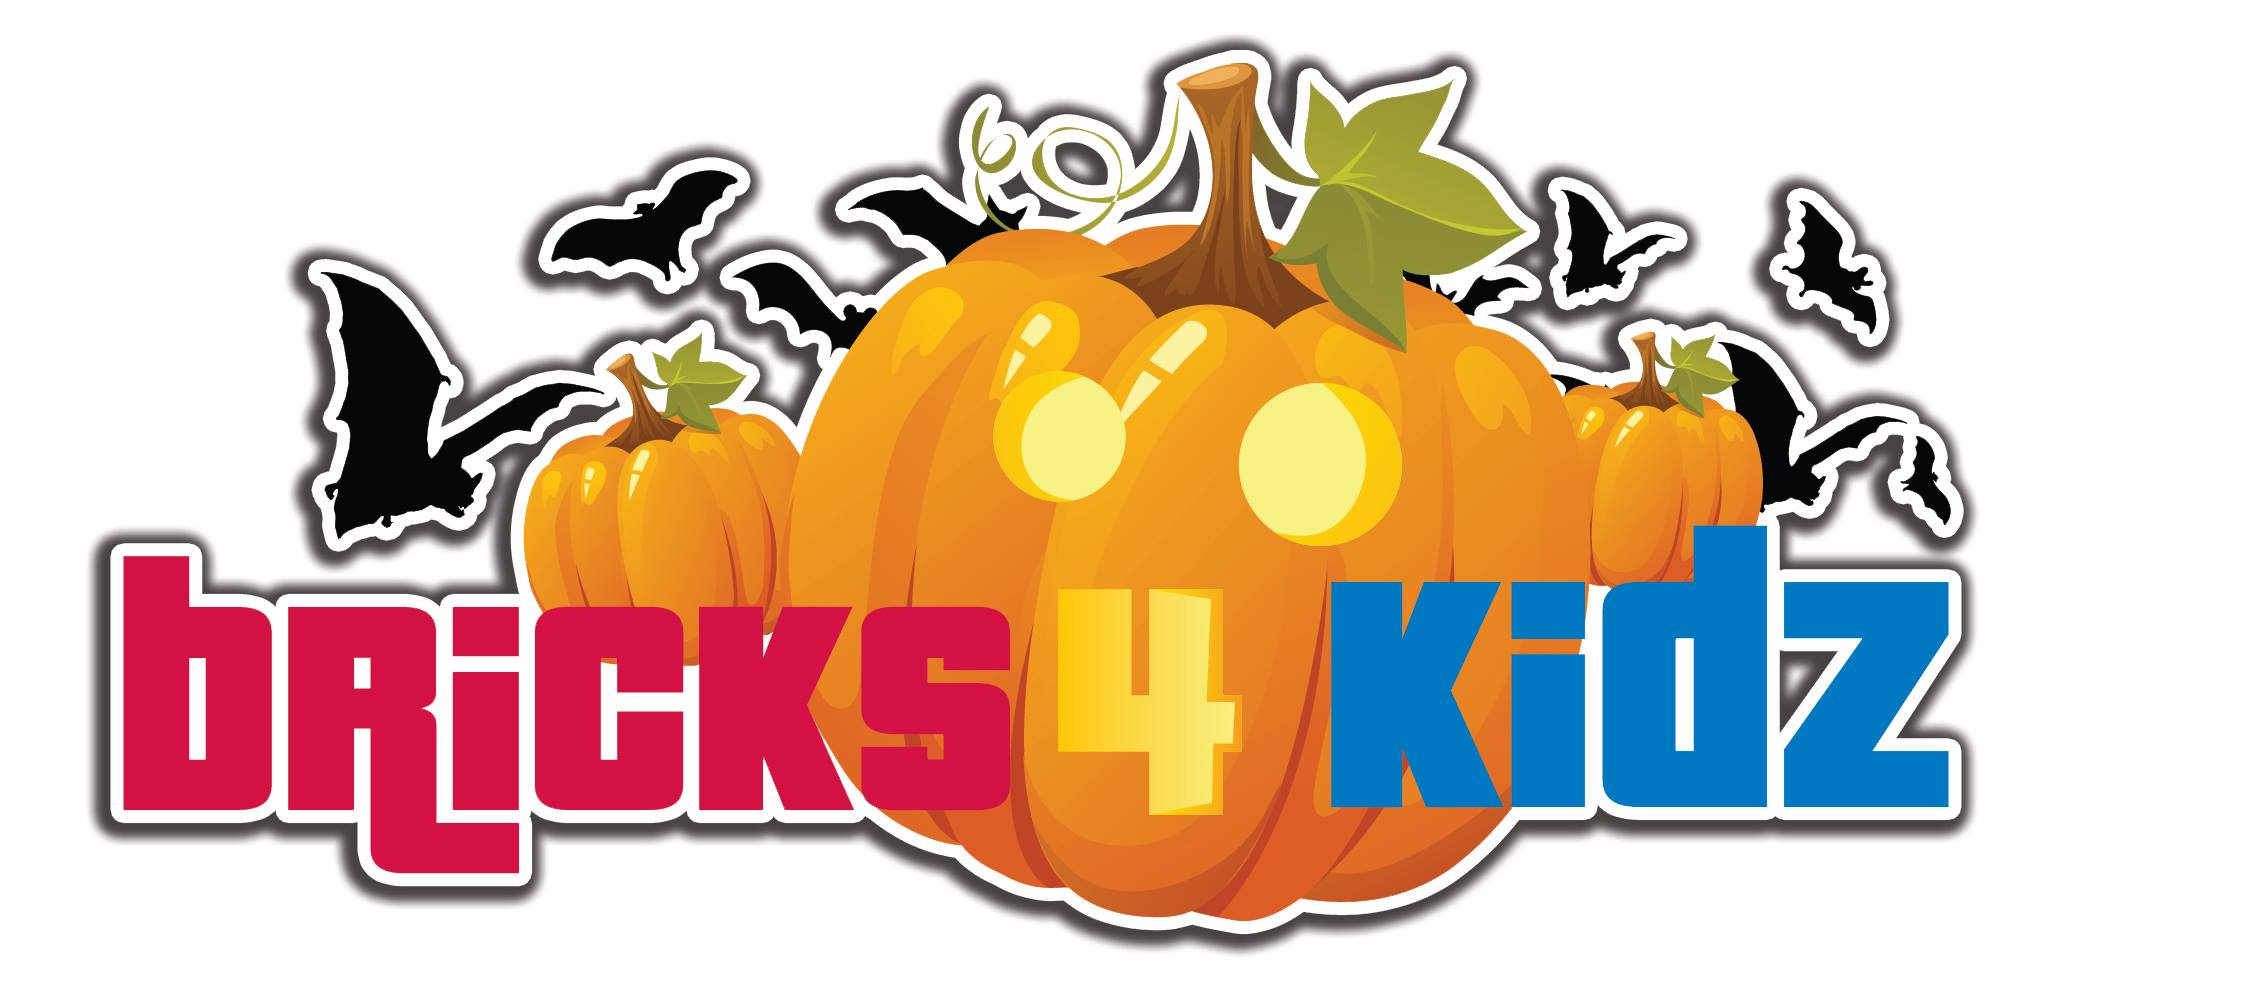 Halloween Event by BRICKS 4 KIDZ on NSW's Central Coast!.